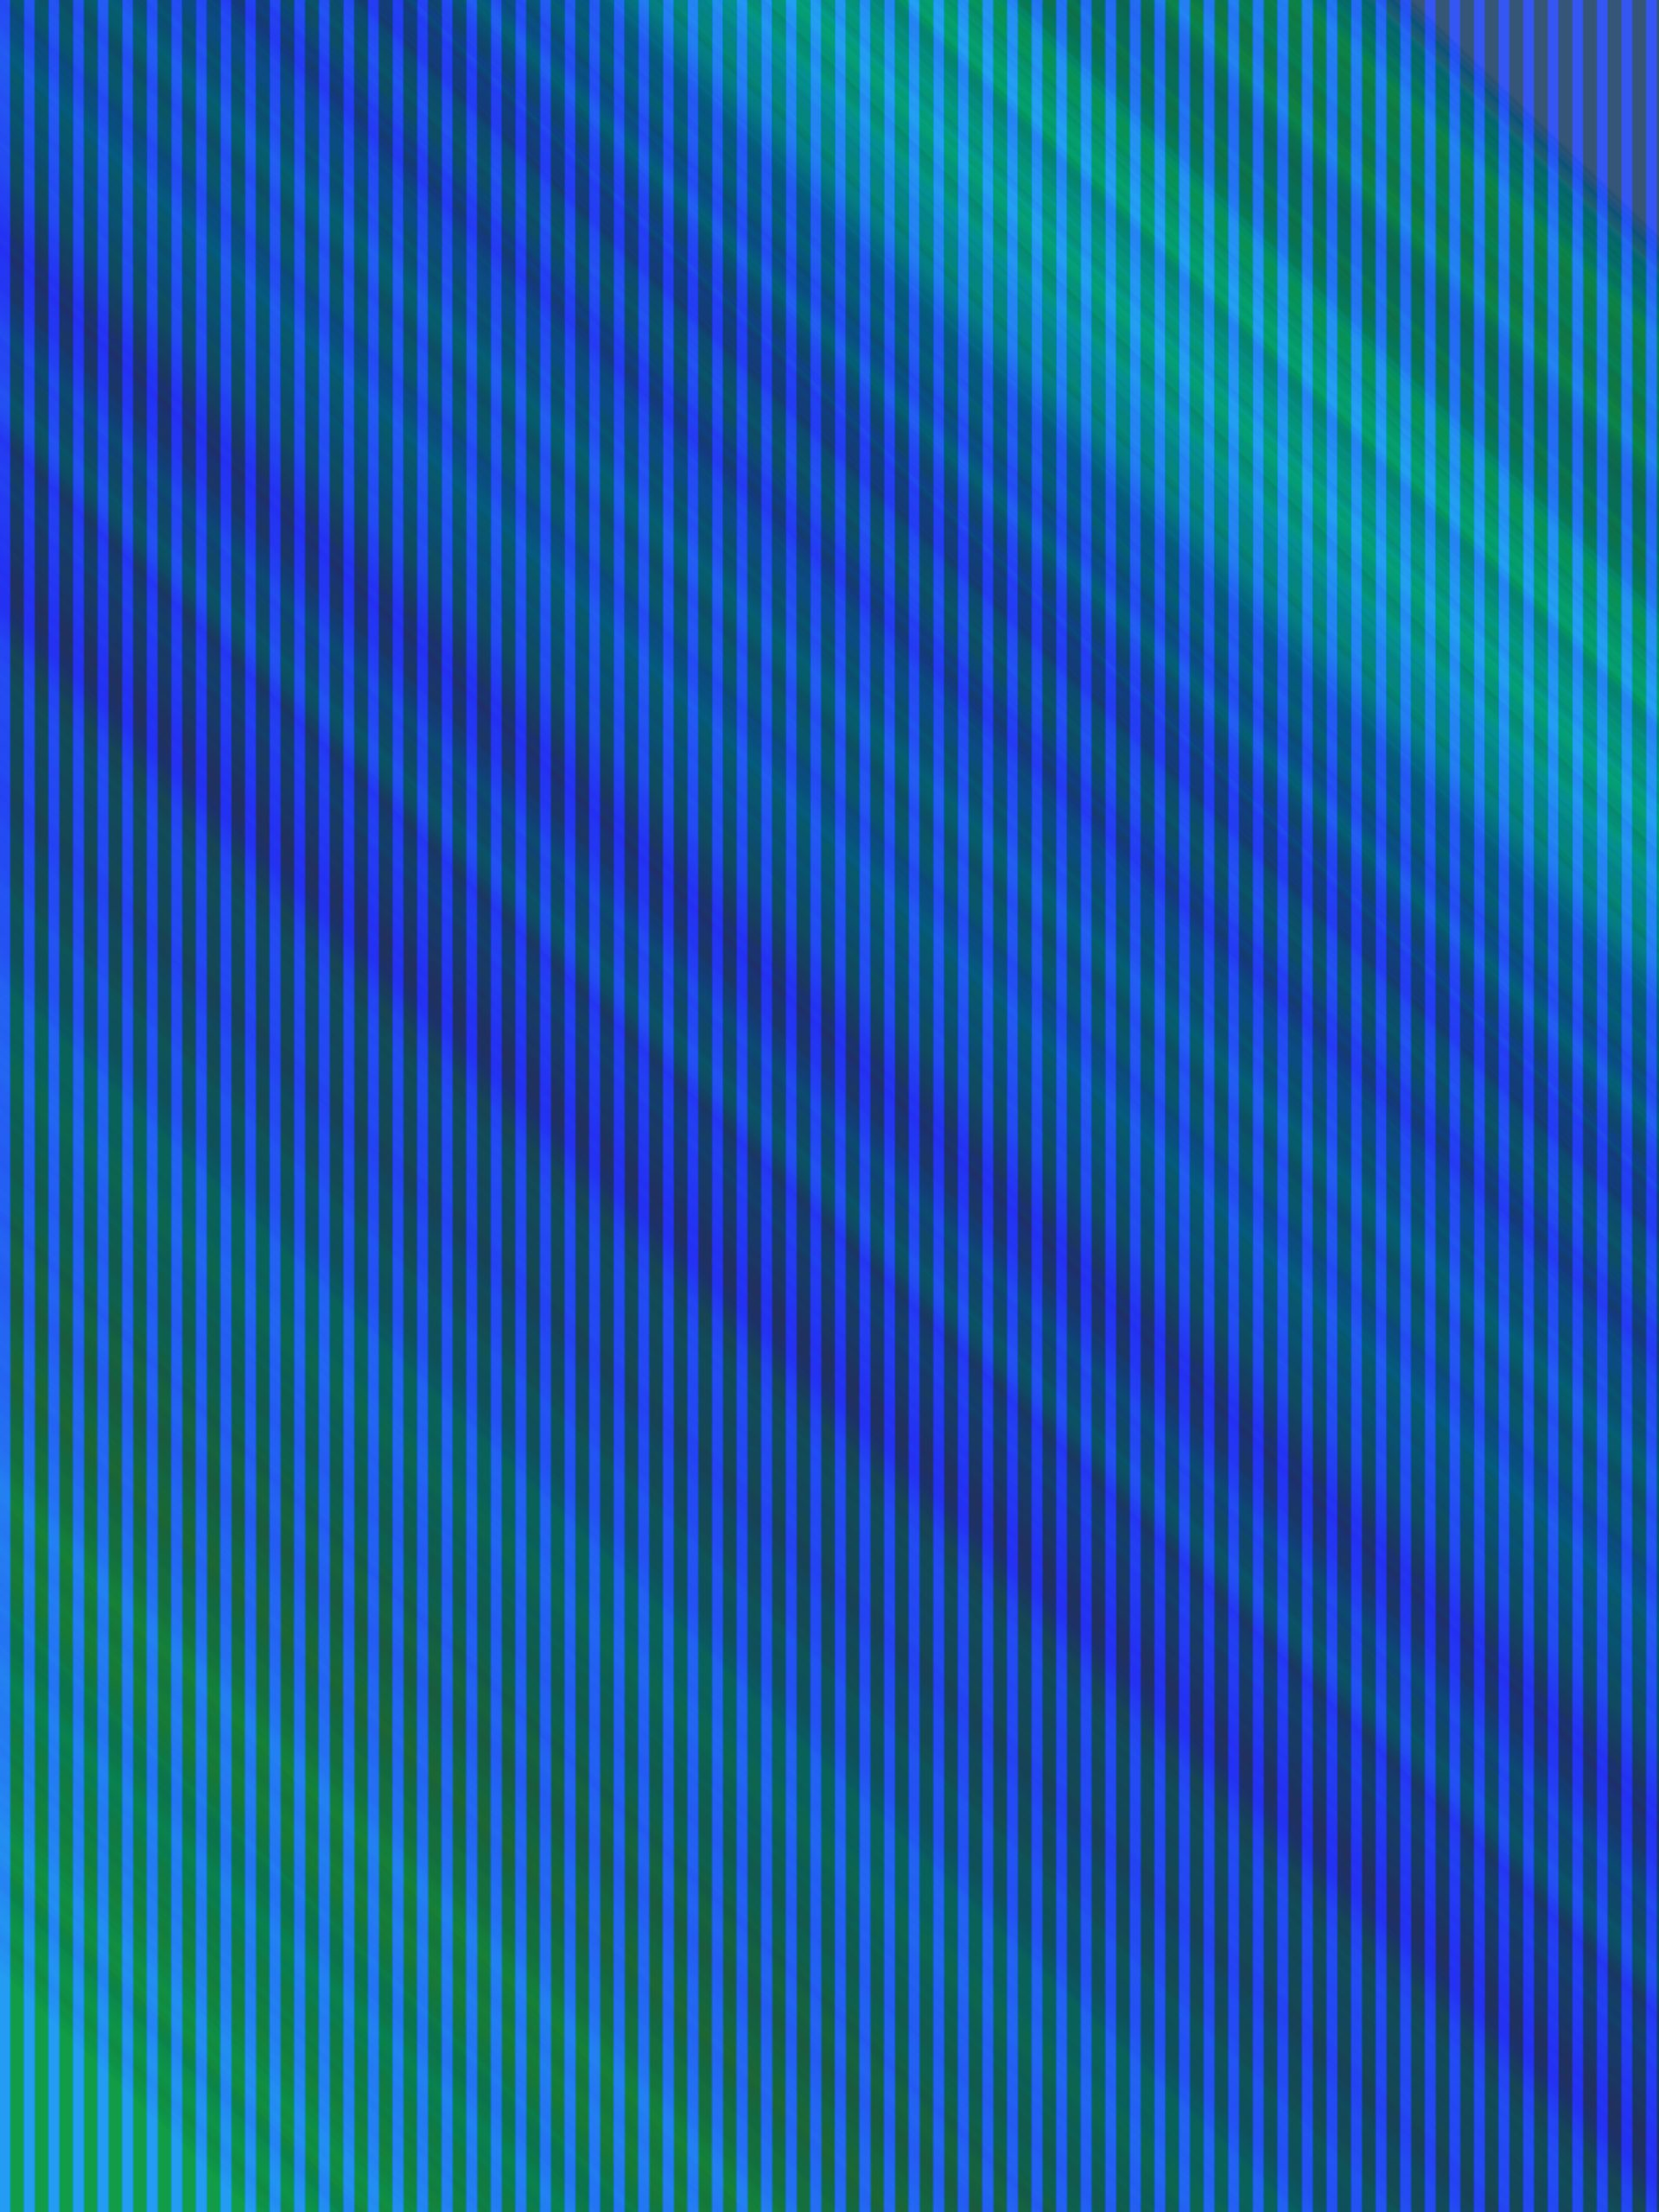 Blue shade lined wallpaper